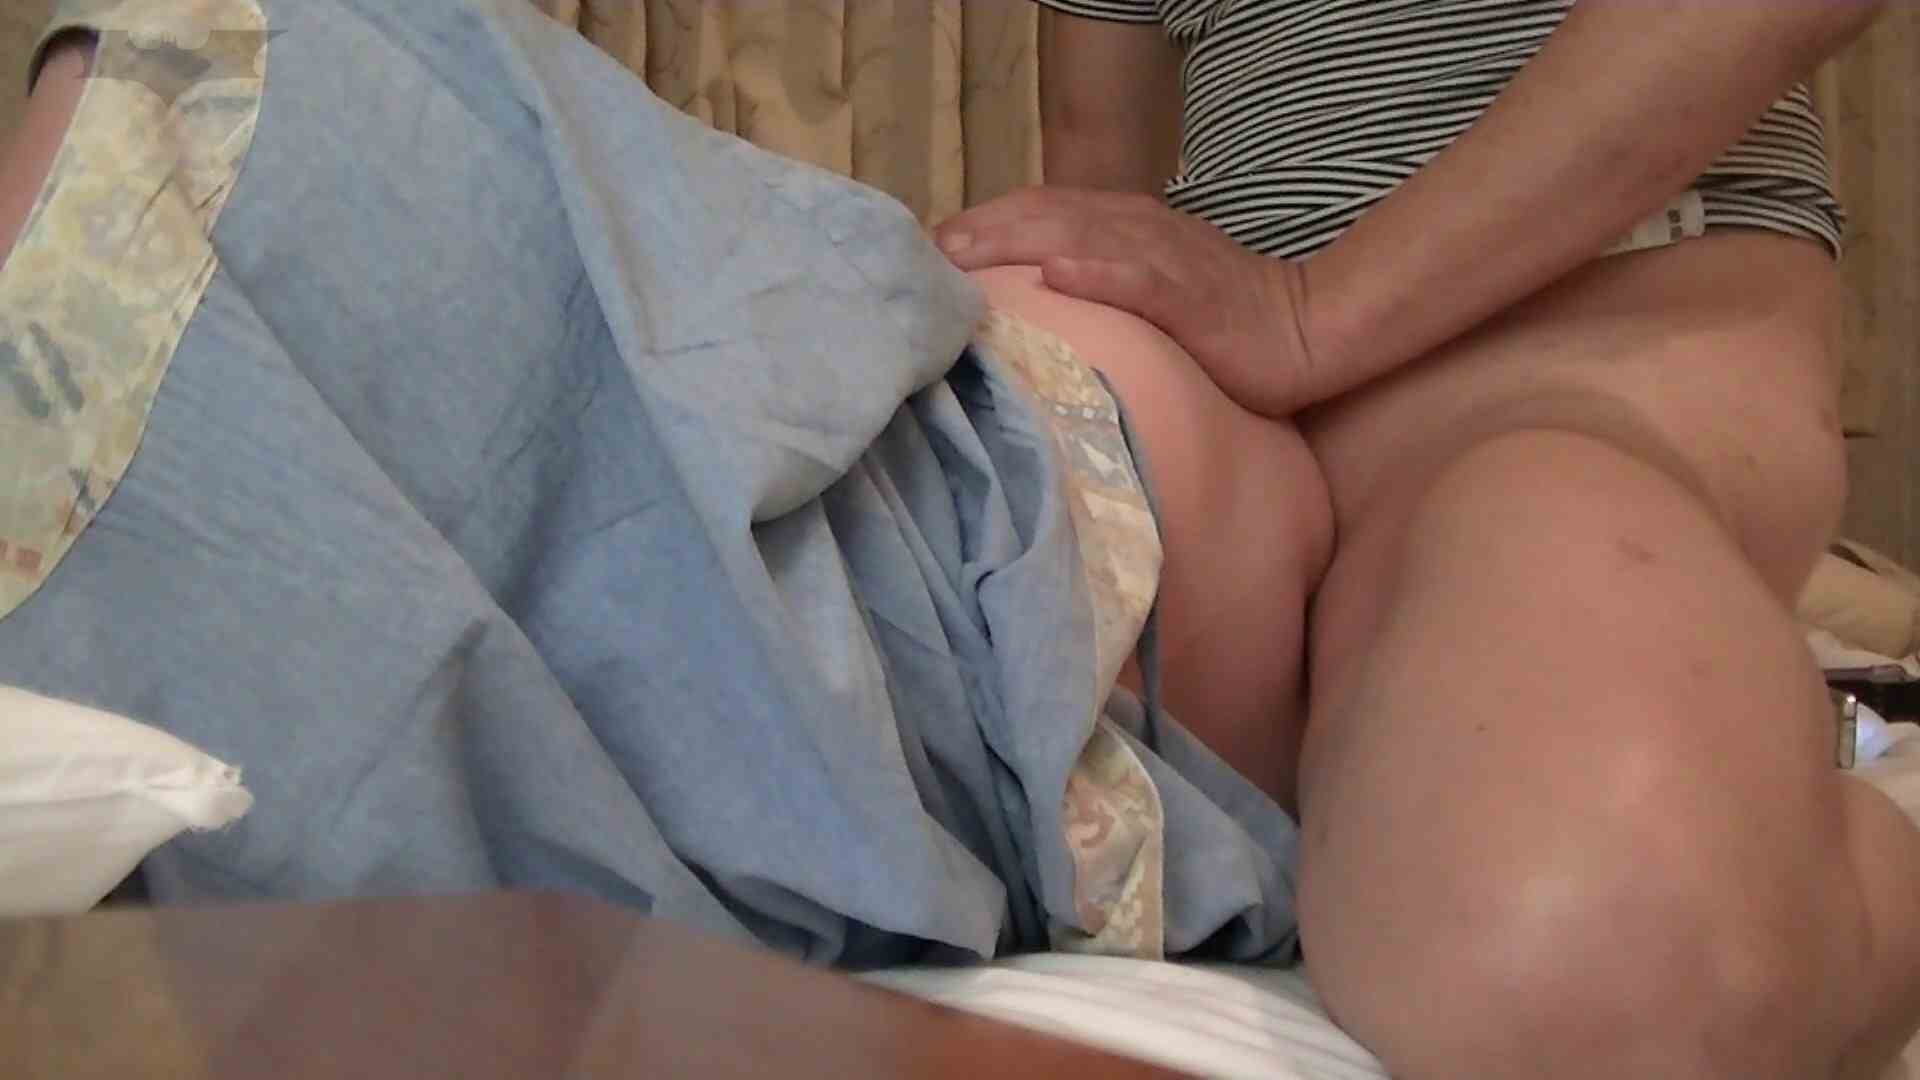 闇の花道 Vol.16 細身女性 オメコ無修正動画無料 88画像 84